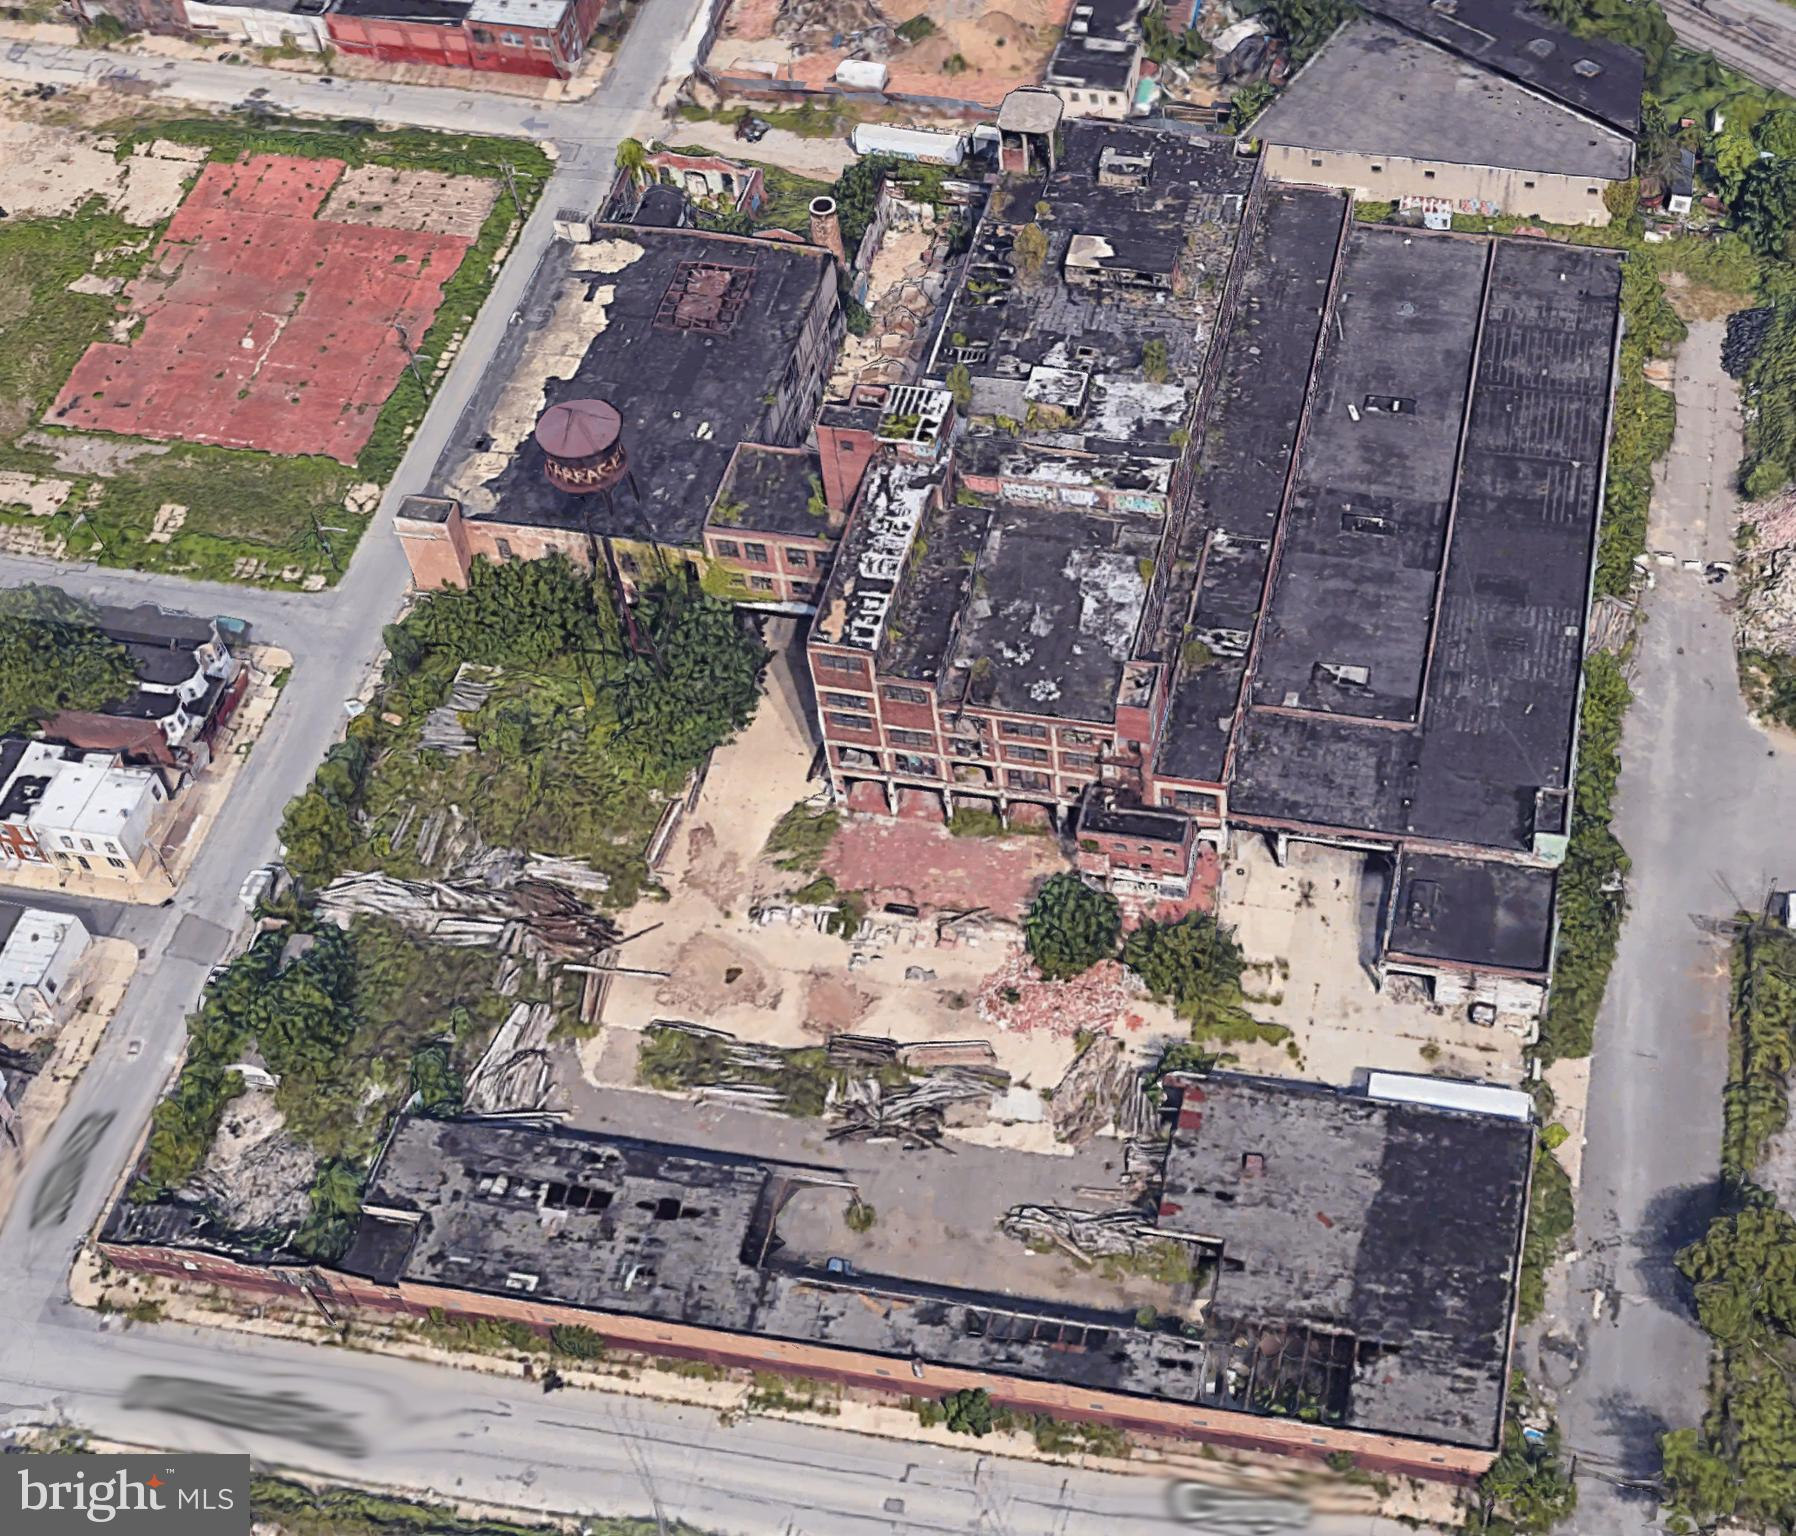 3001 N 20TH STREET, PHILADELPHIA, PA 19132